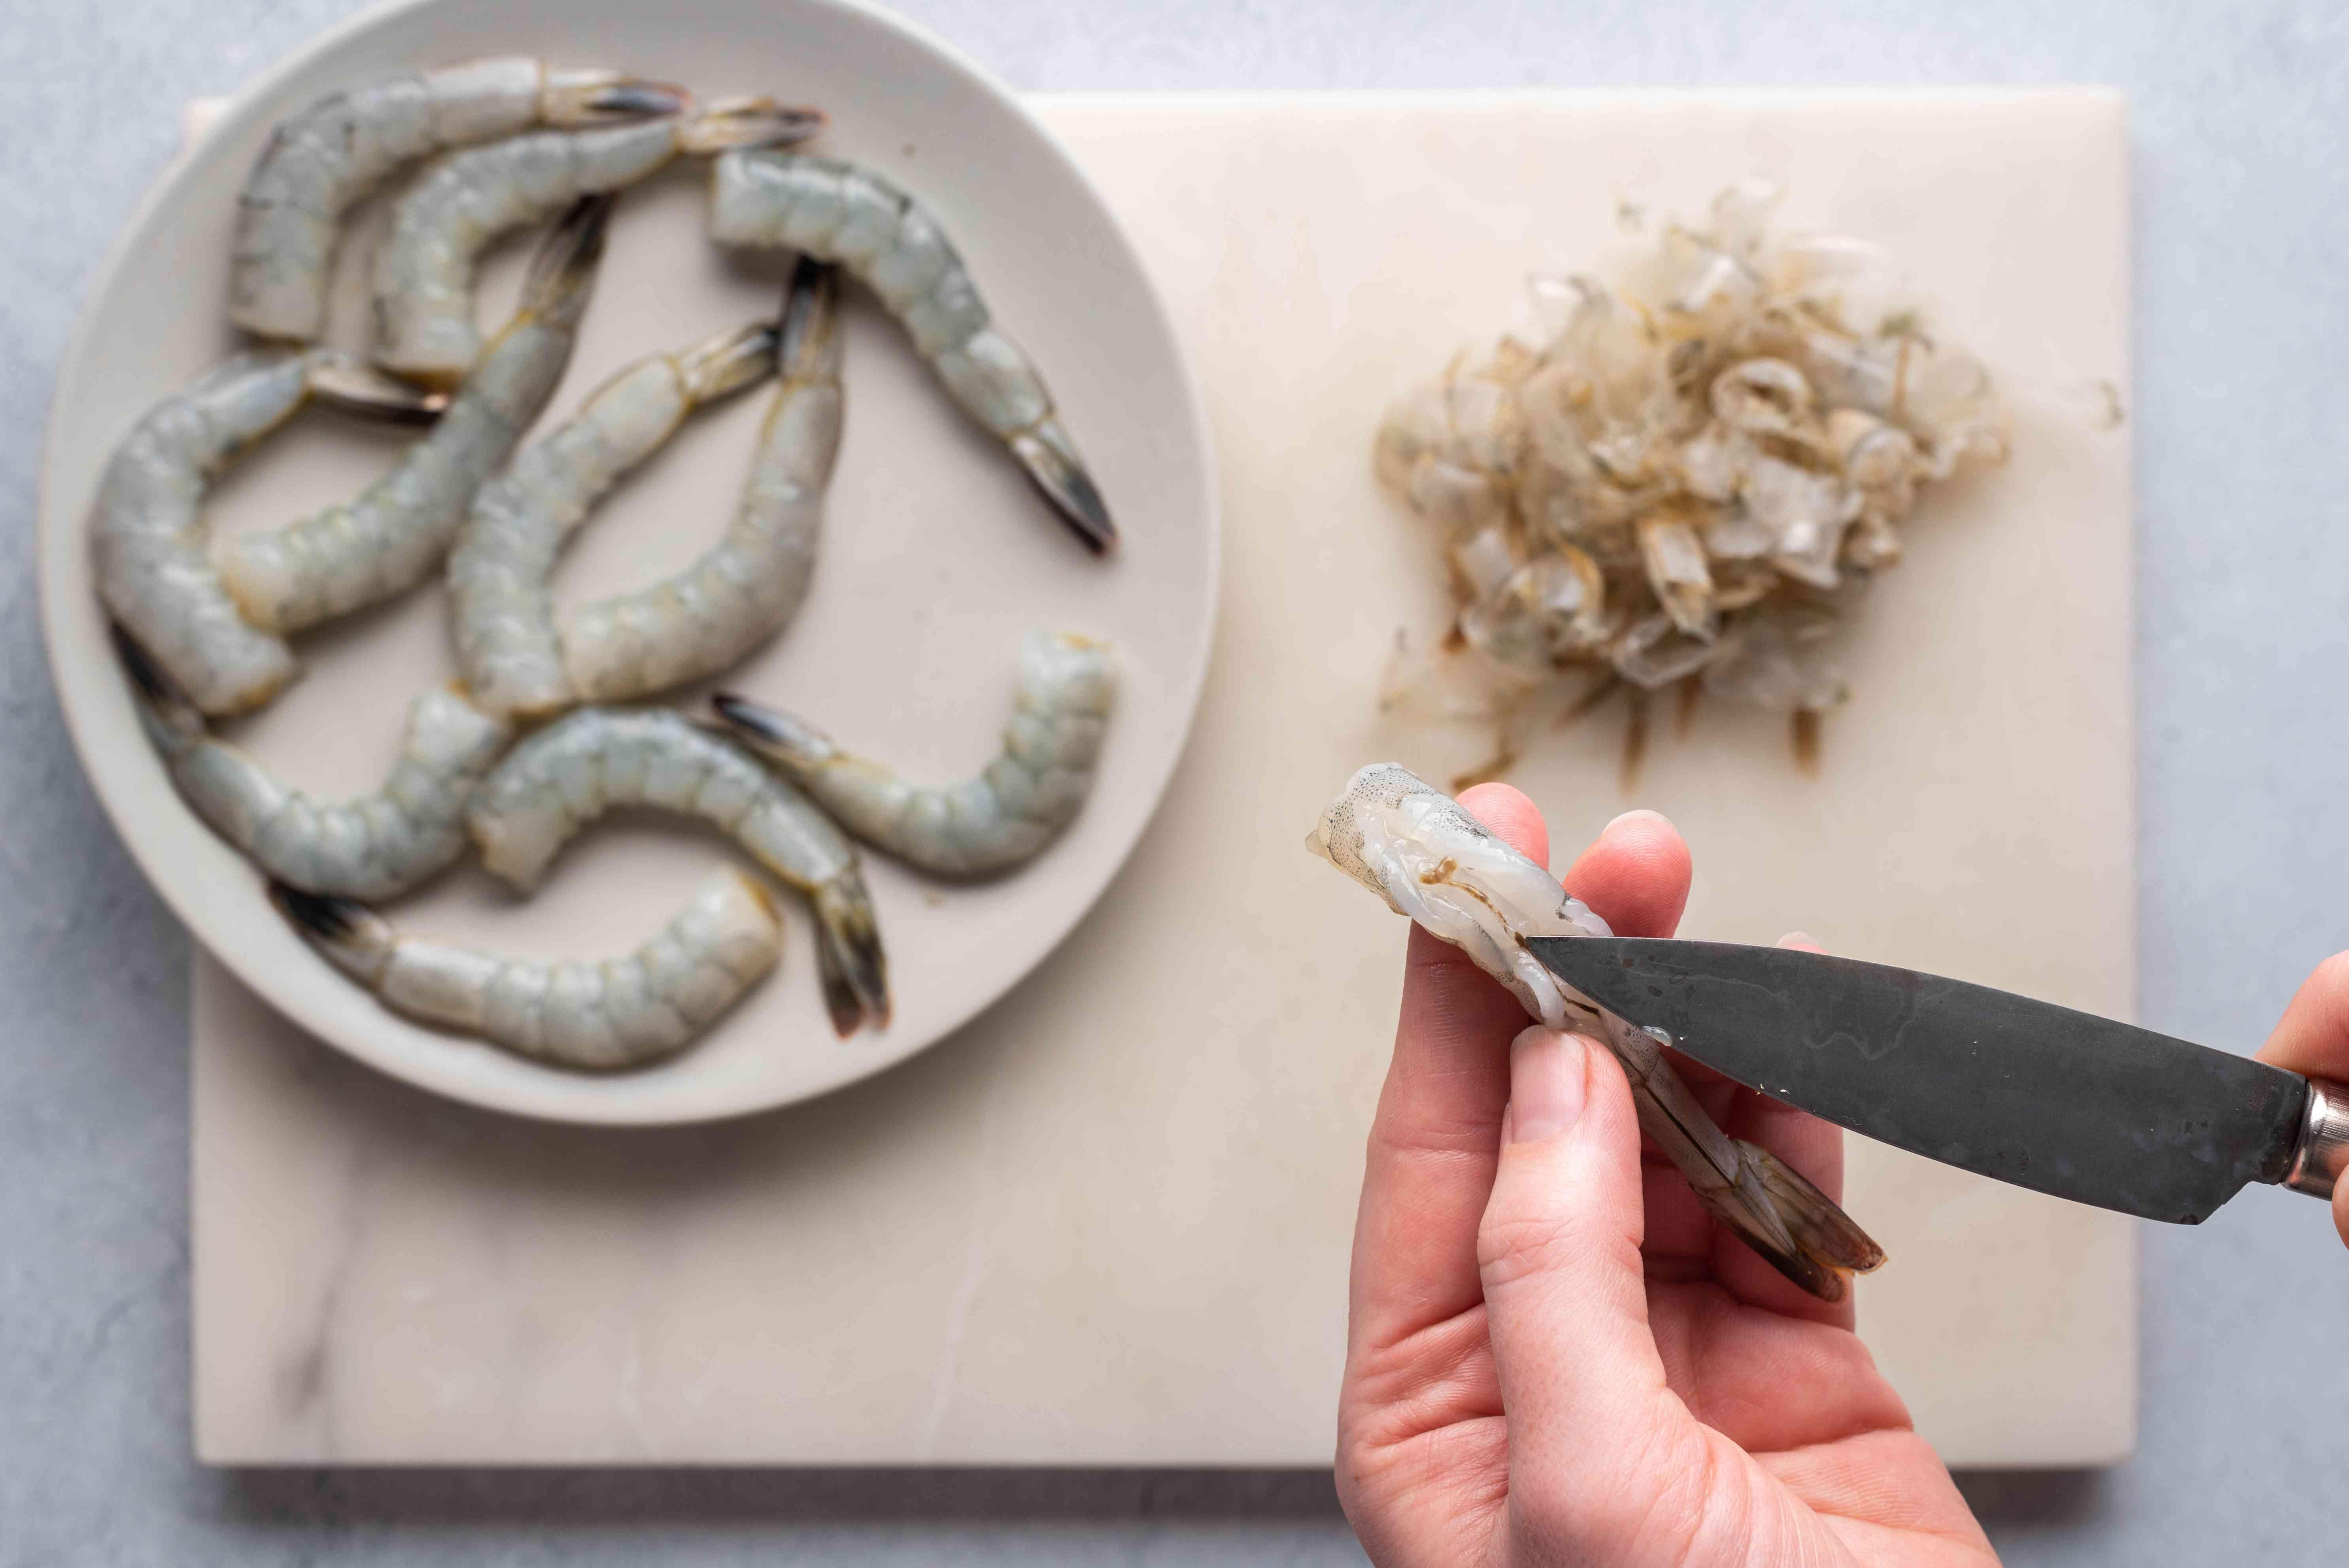 Devein the shrimp